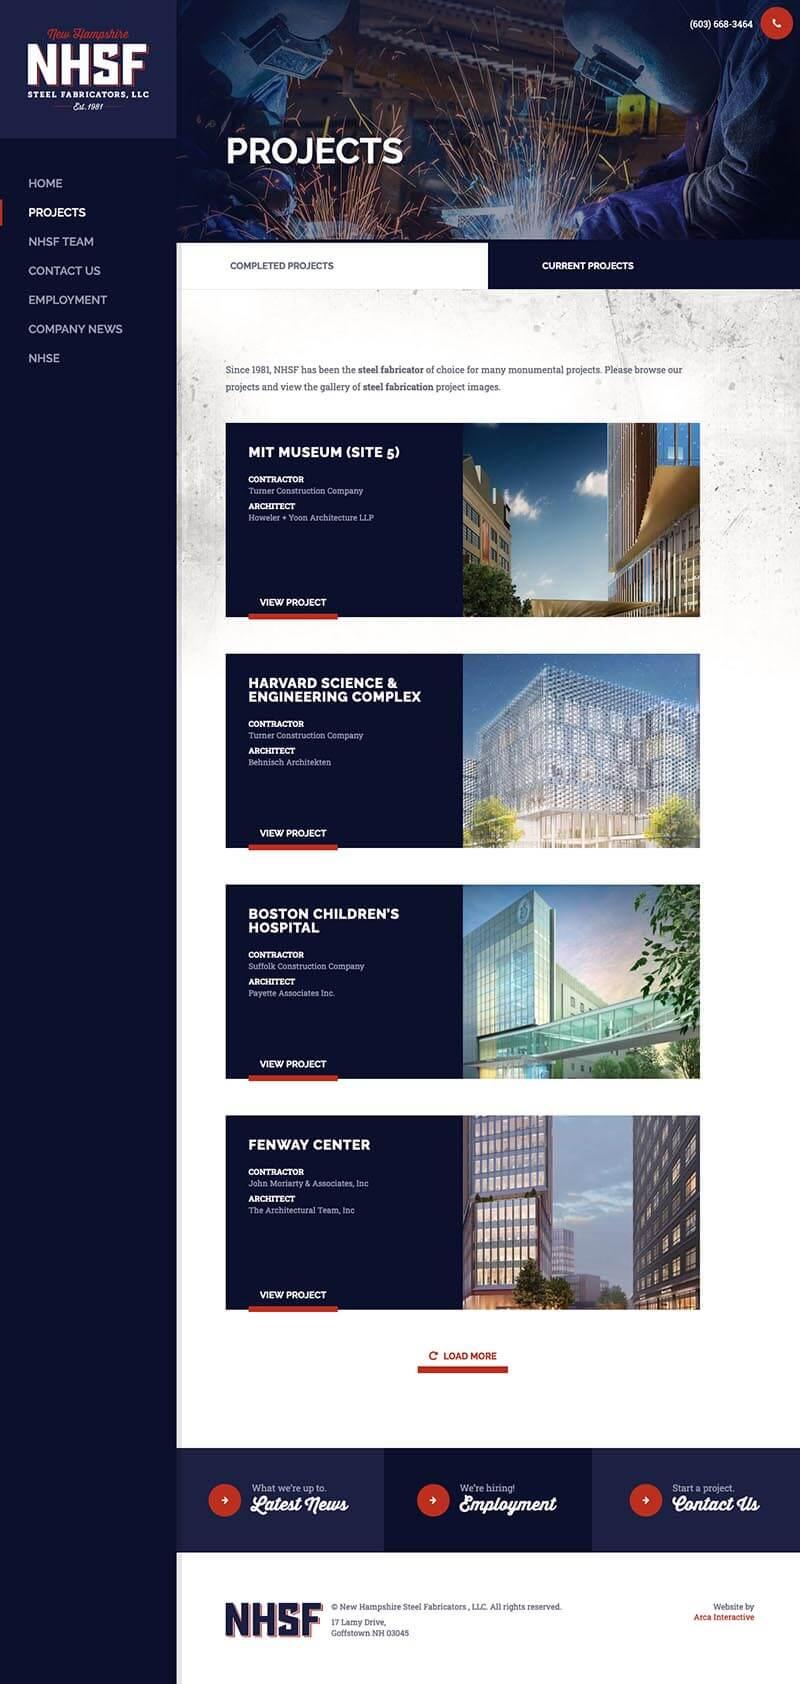 new-hampshire-steel-fabricators-website-development